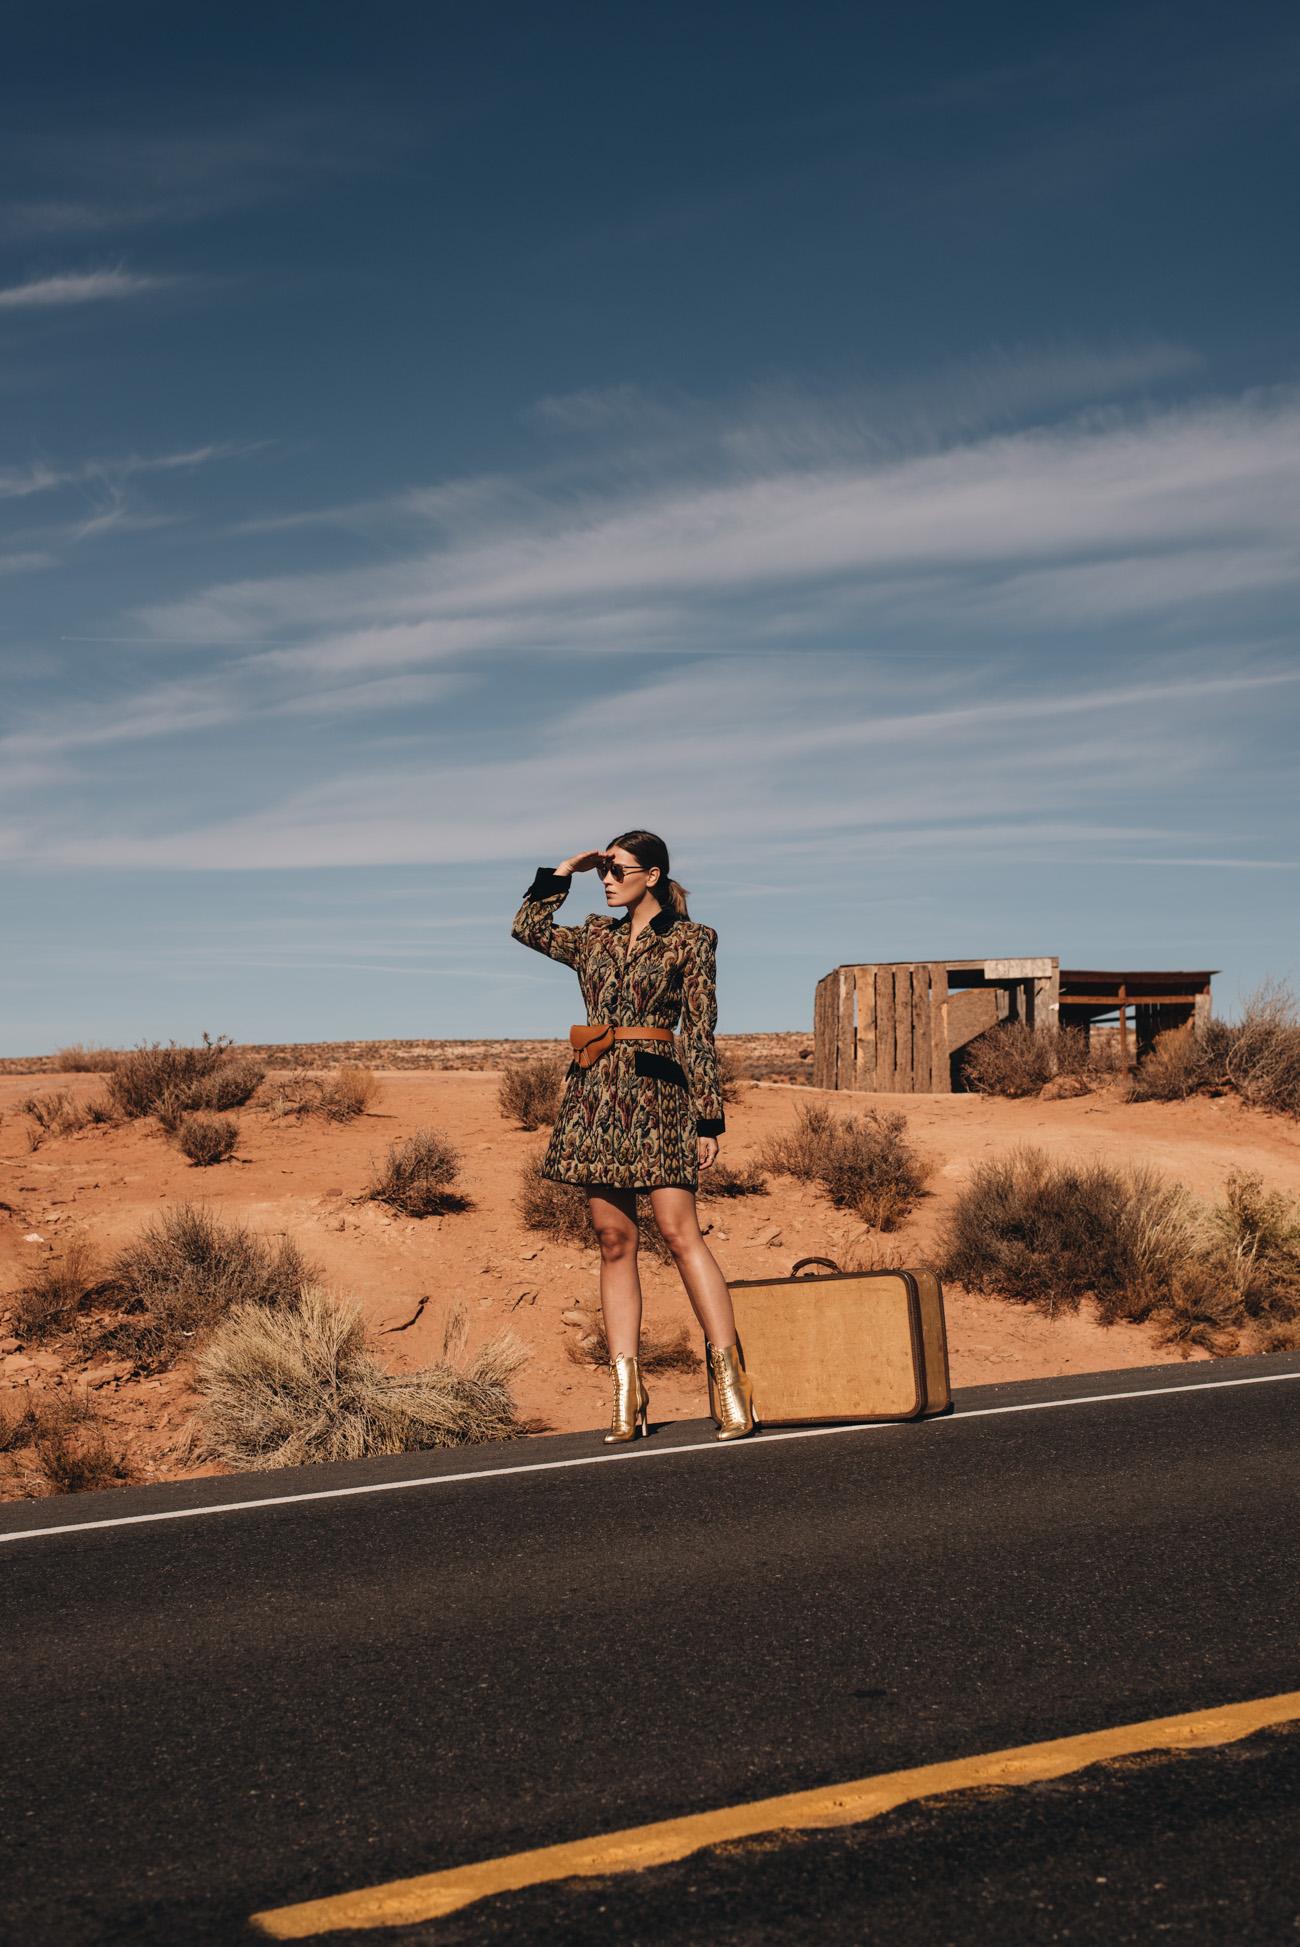 Highway-Luxus-Fotoshooting-Mode-Foto-shooting-wüste-monument-valley-kalifornien-outdoor-fashion-editorial-shooting-mode-bloggerin-fashionbloggerin-fashiioncarpet-nina-schwichtenberg